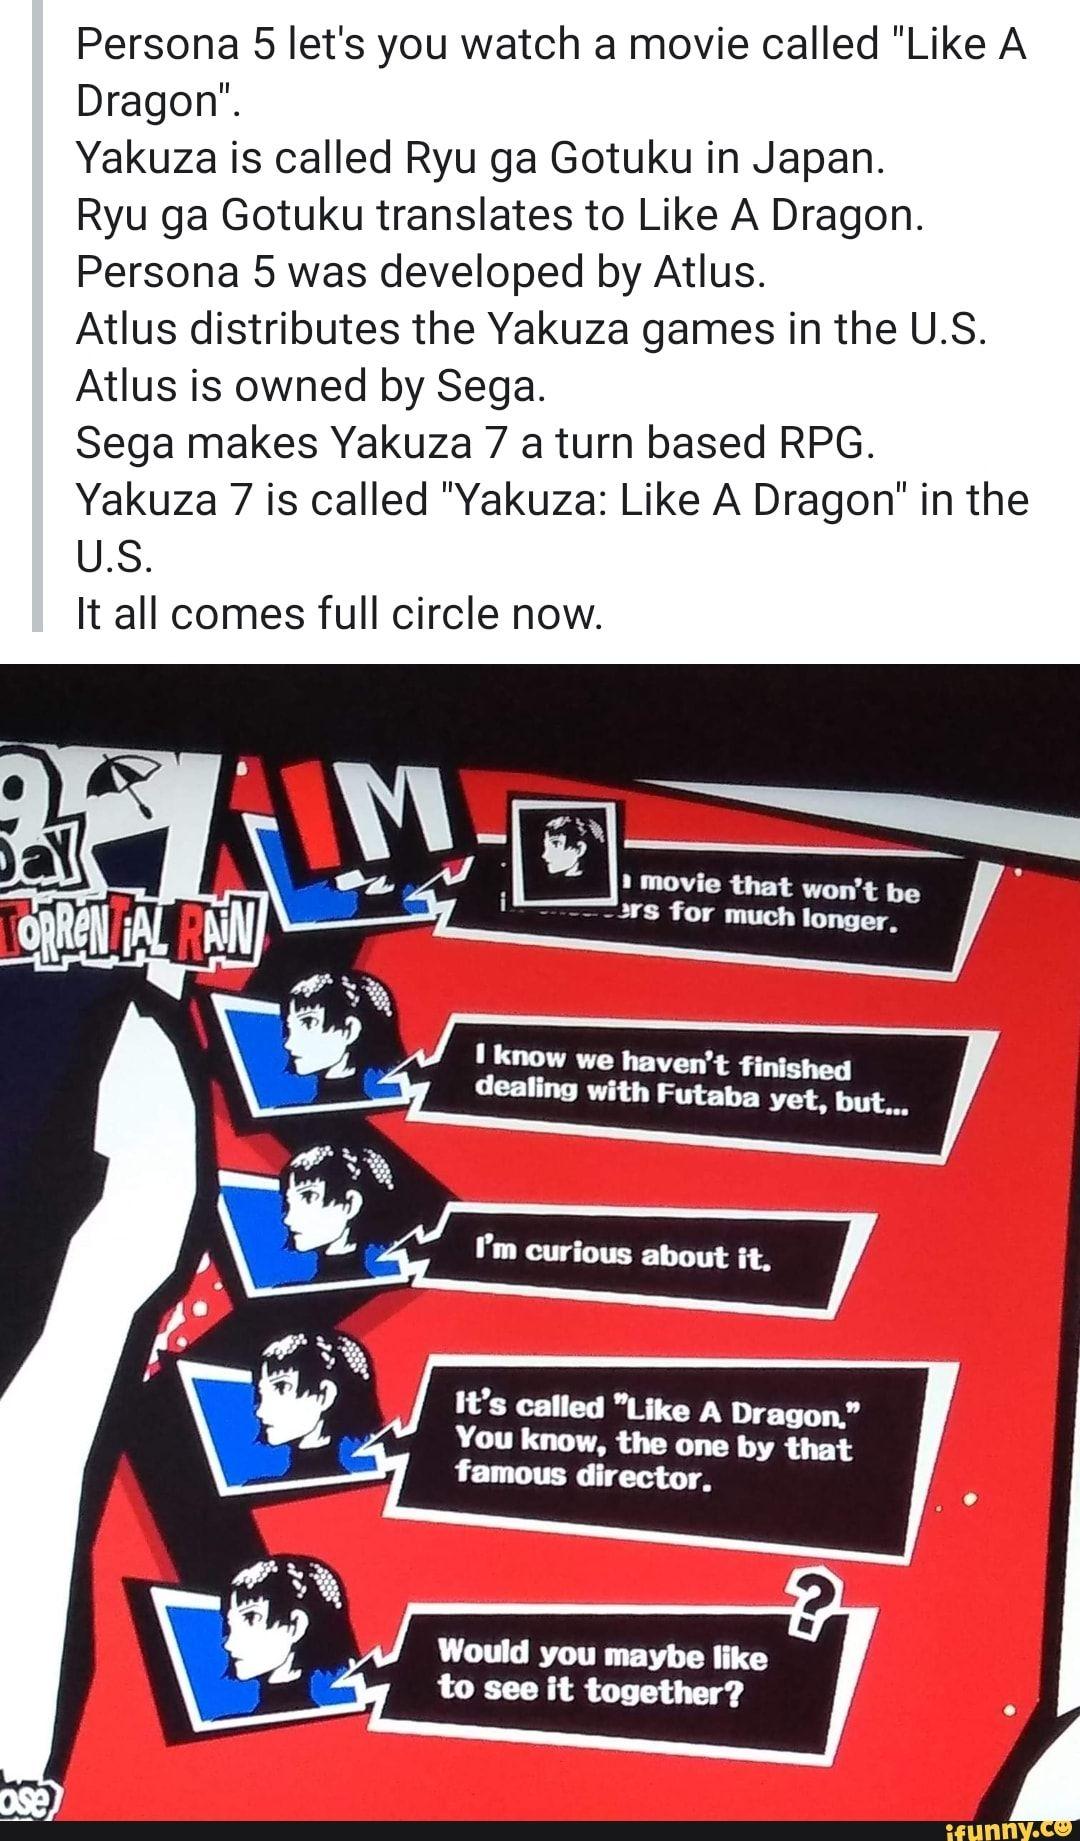 Persona 5 Let S You Watch A Movie Called Like A Dragon Yakuza Is Called Ryu Ga Gotuku In Japan Ryu Ga Gotuku Translates To Like A Dragon Persona 5 Was Deve